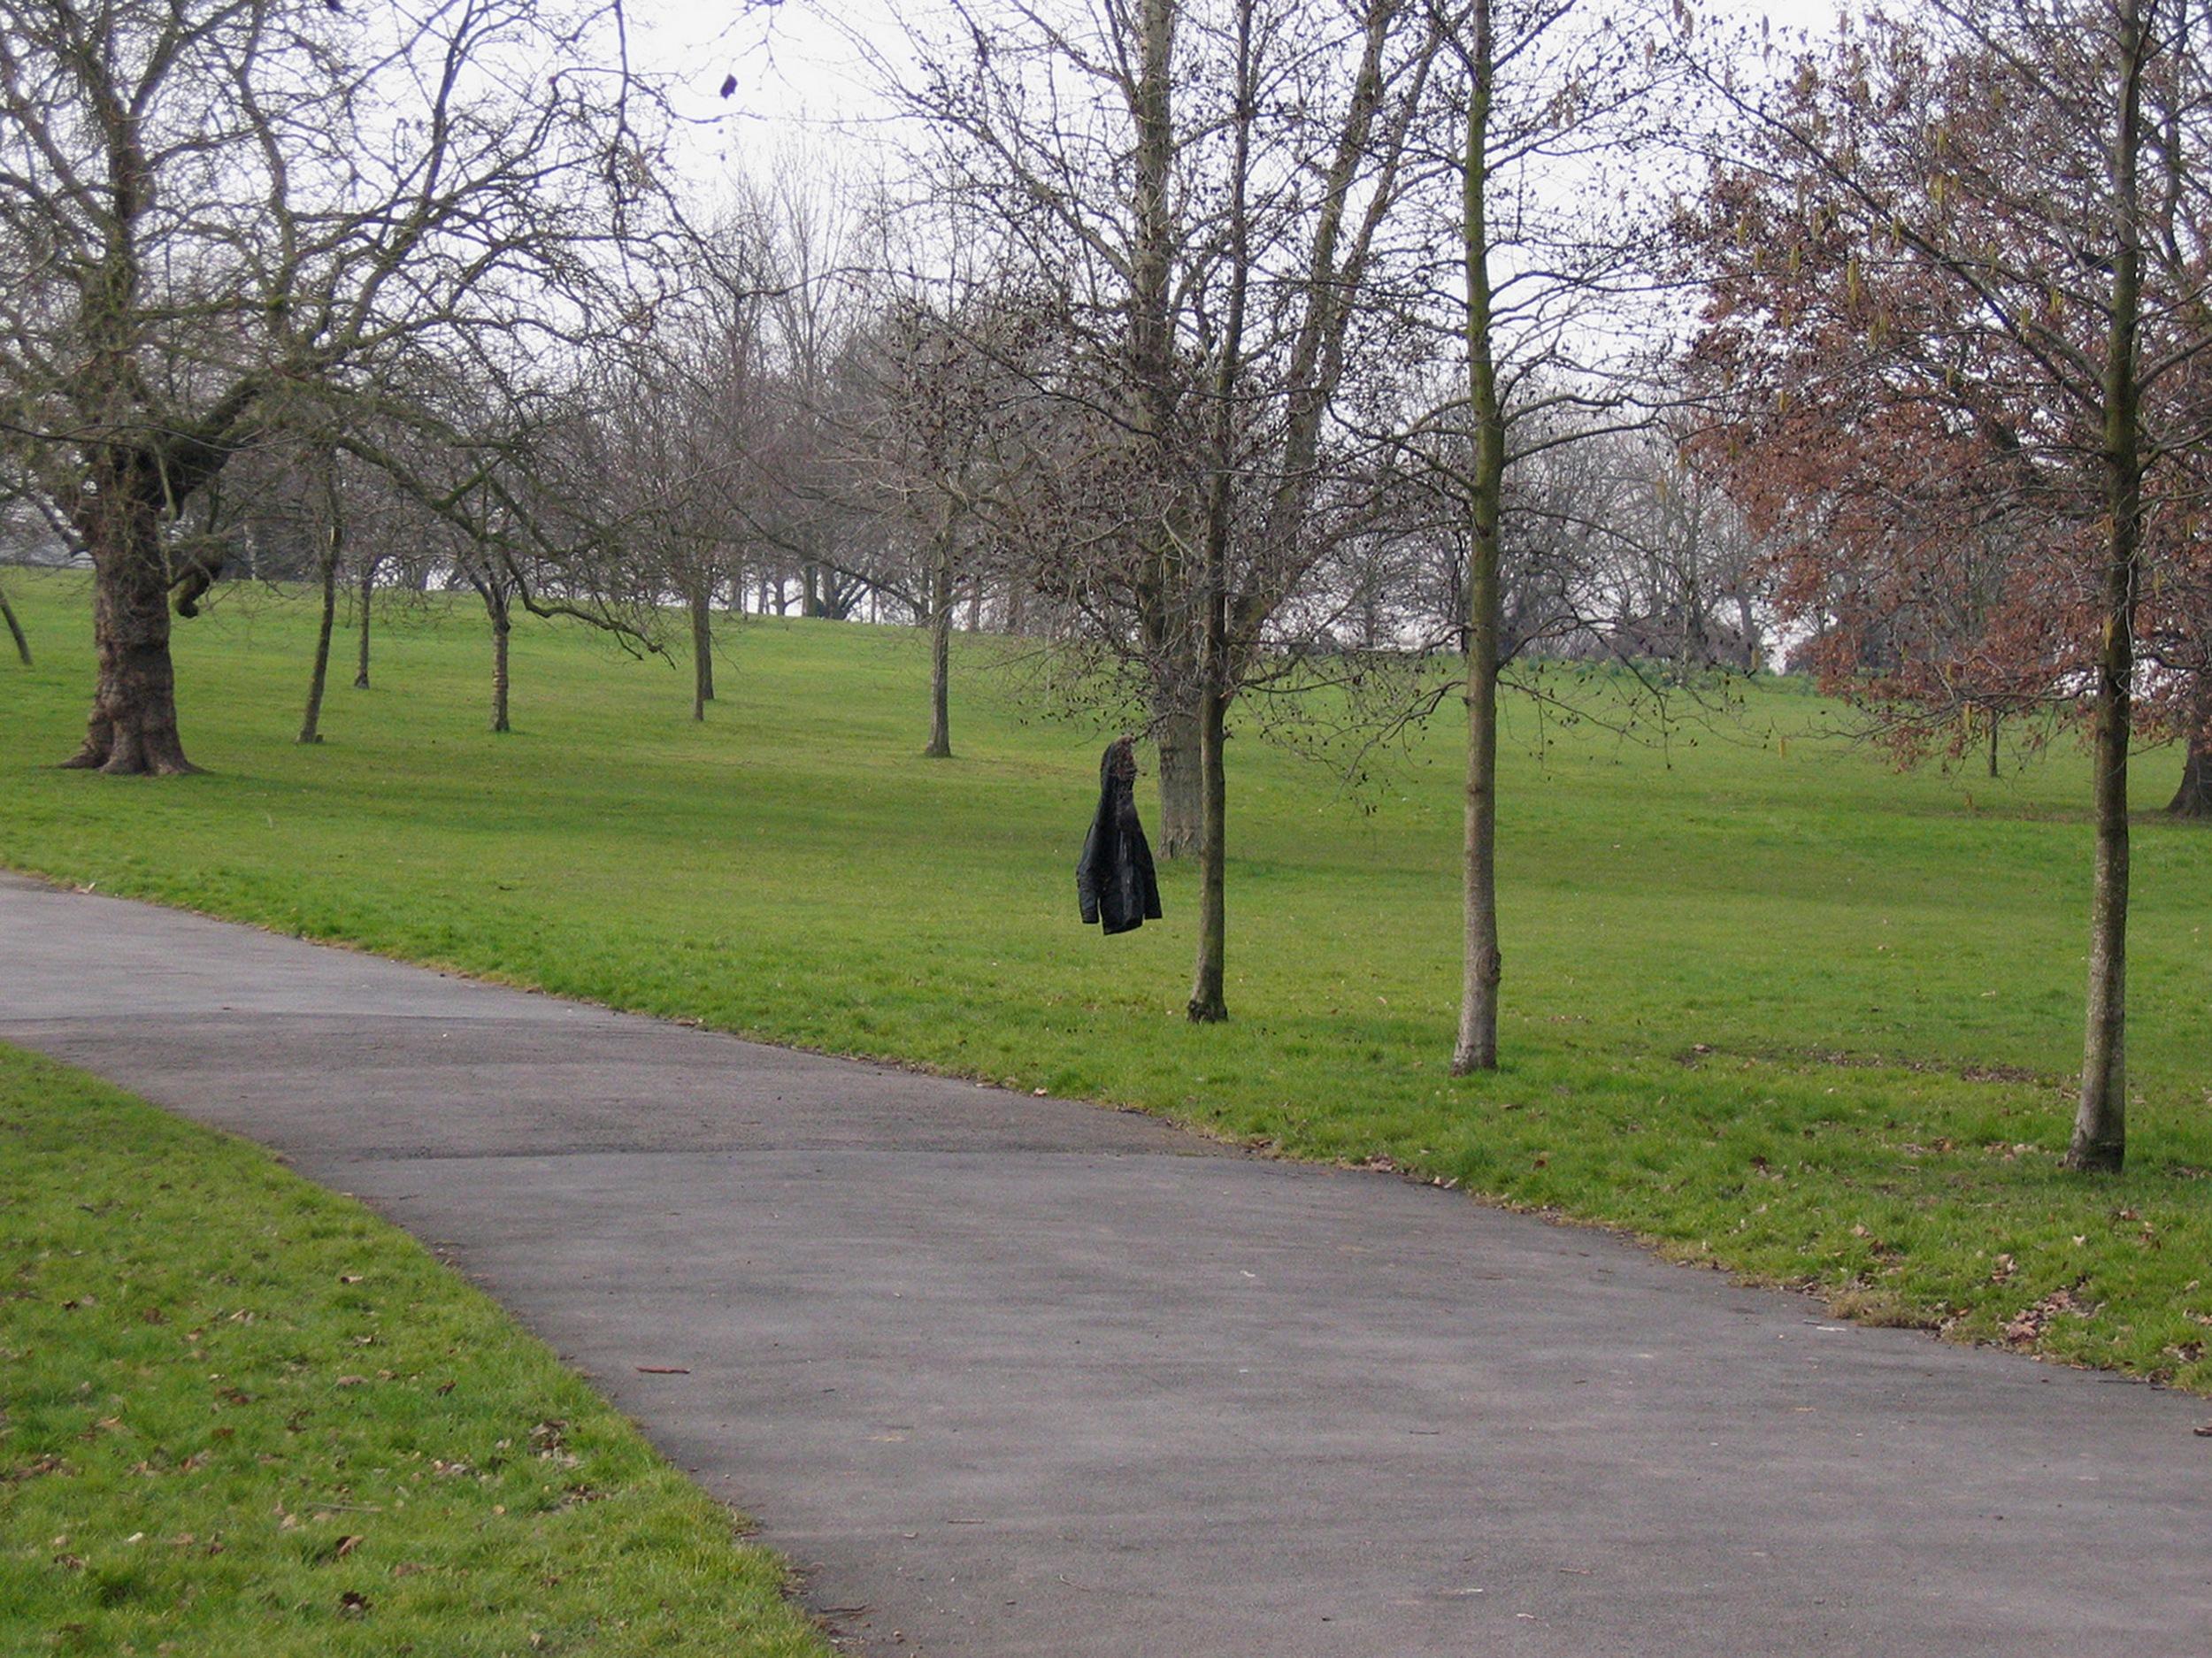 Untitled (cloak),Framed Digital Print, 22.5x30cm, 2005